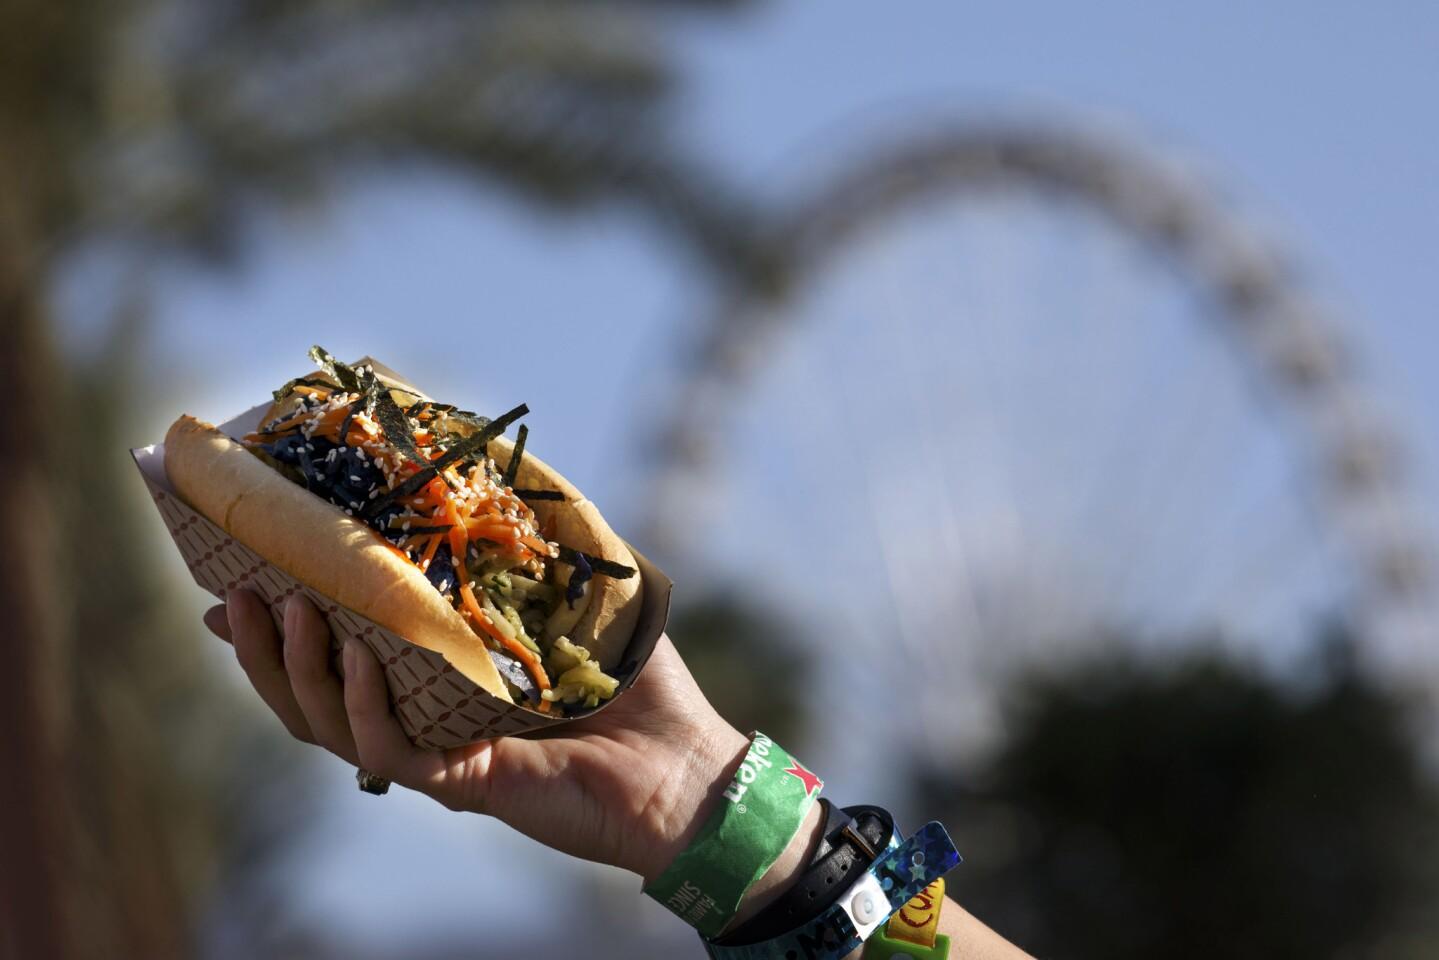 2017 Coachella music festival: The food